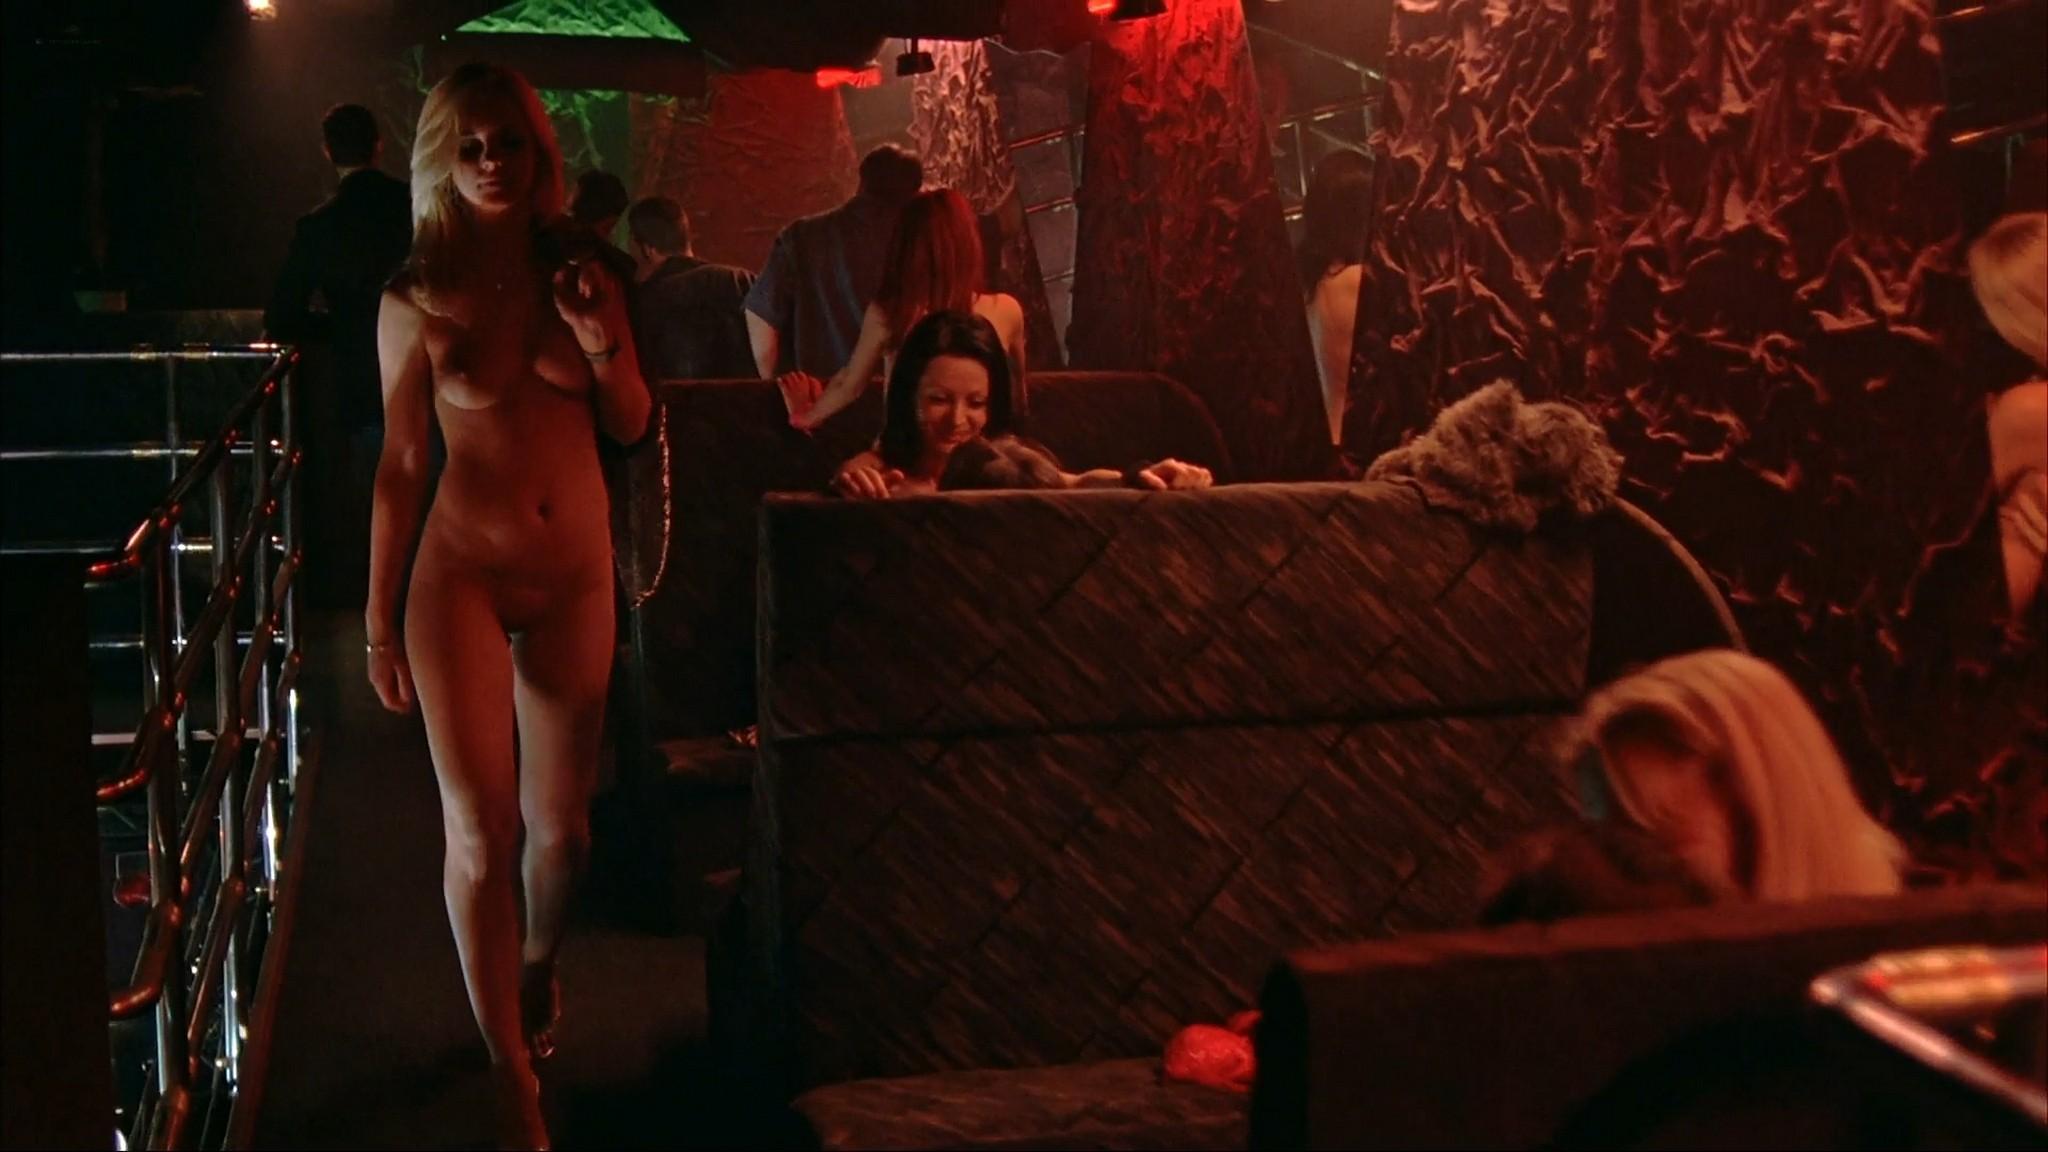 Lori Heuring nude sex threesome Zita Gorog Francesca Kingdon Judit Viktor and Sandra Shine all nude full frontal 8MM 2 2005 1080p Web 12